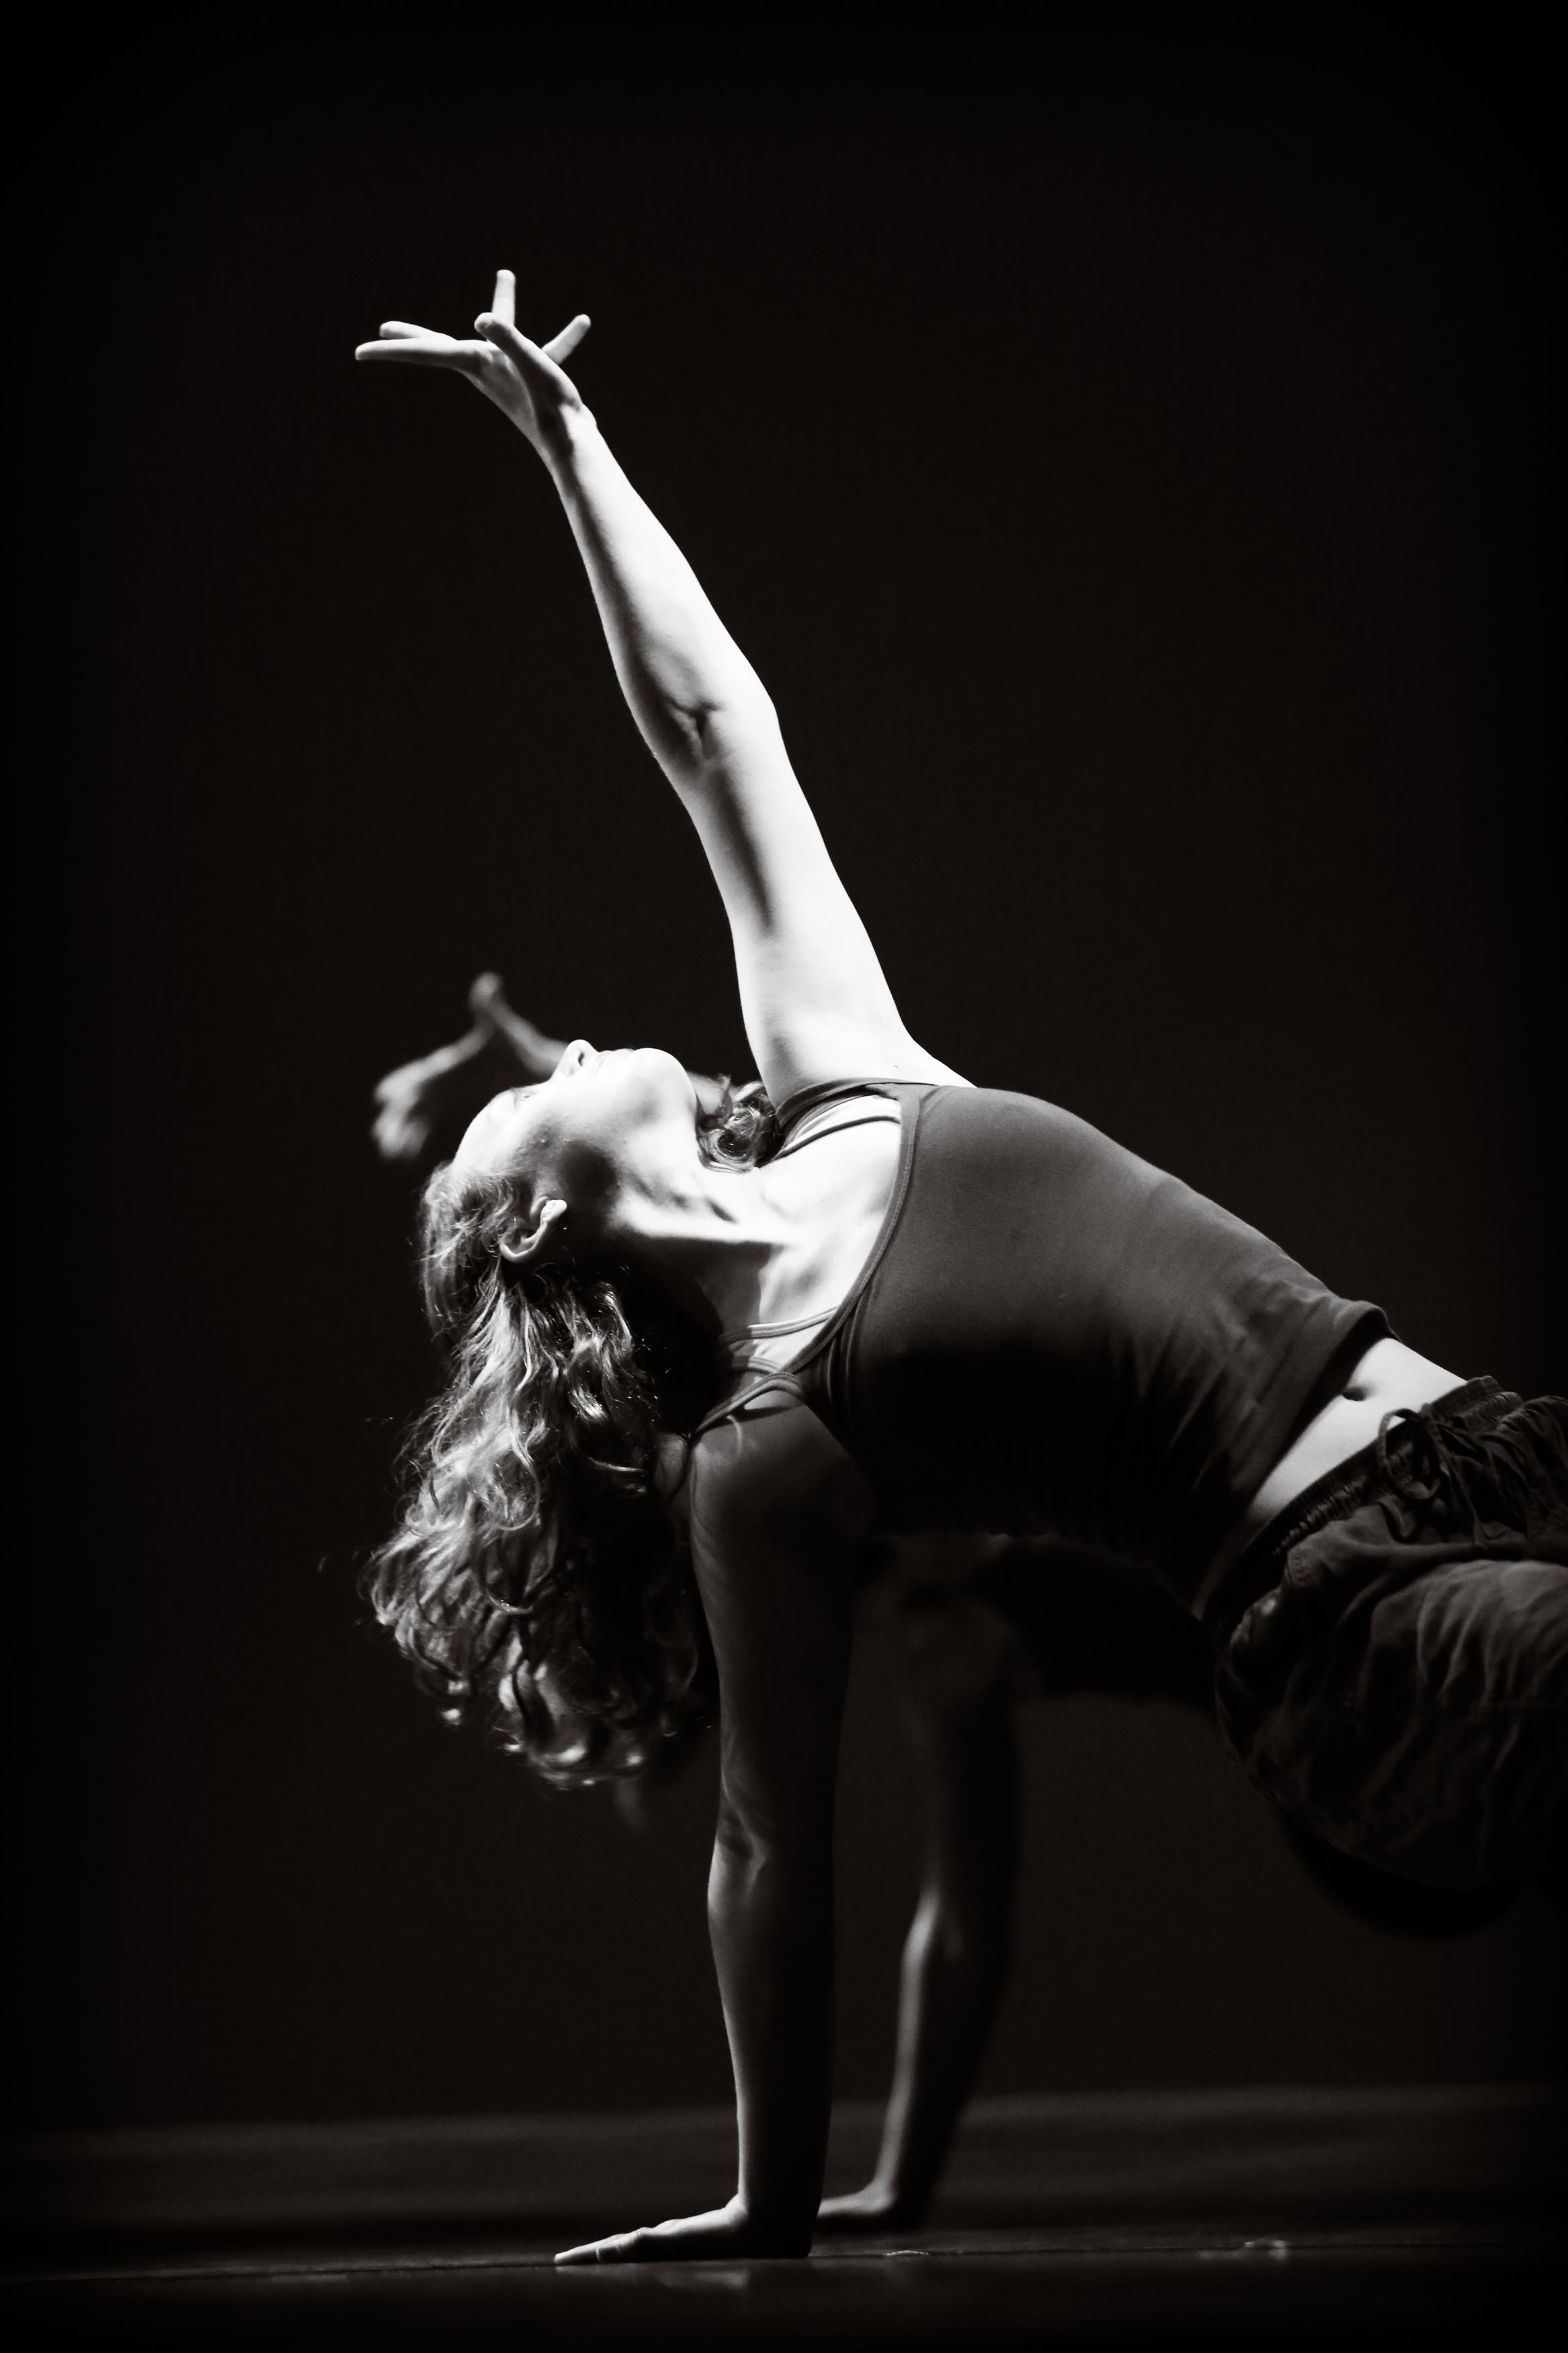 BHSdanceBHSdanceBHS dance5B0A6121002480055300079.jpg